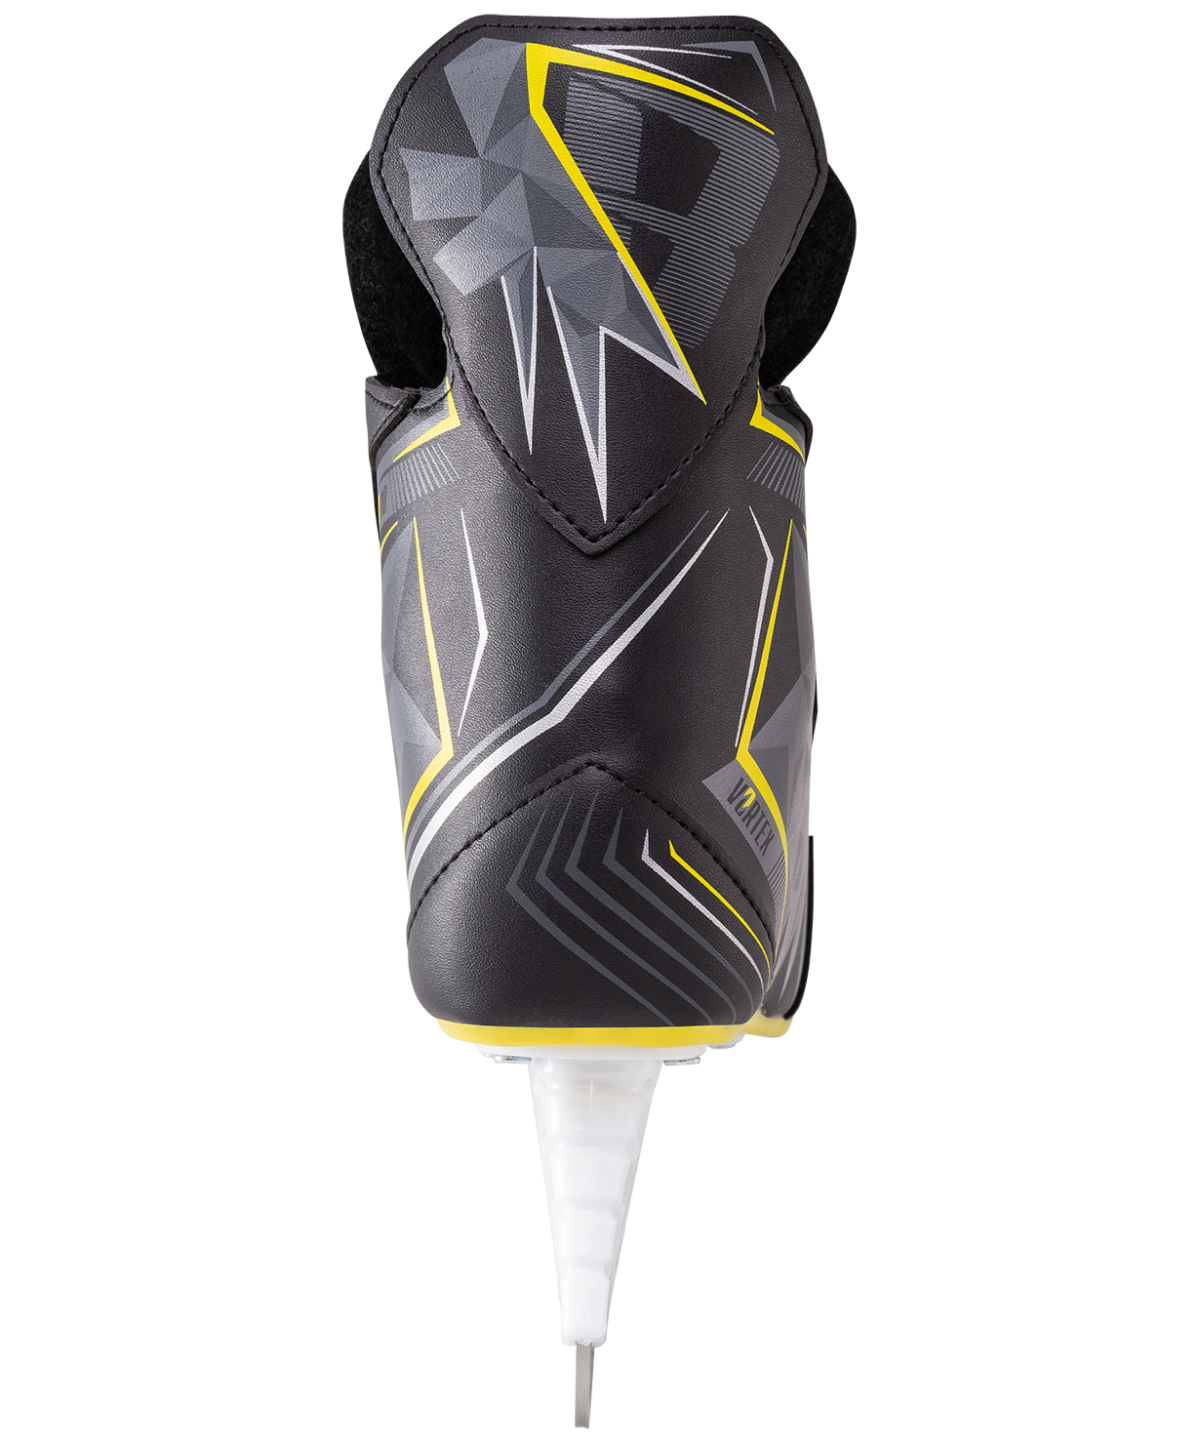 ICE BLADE Коньки хоккейные Vortex V110 - 6